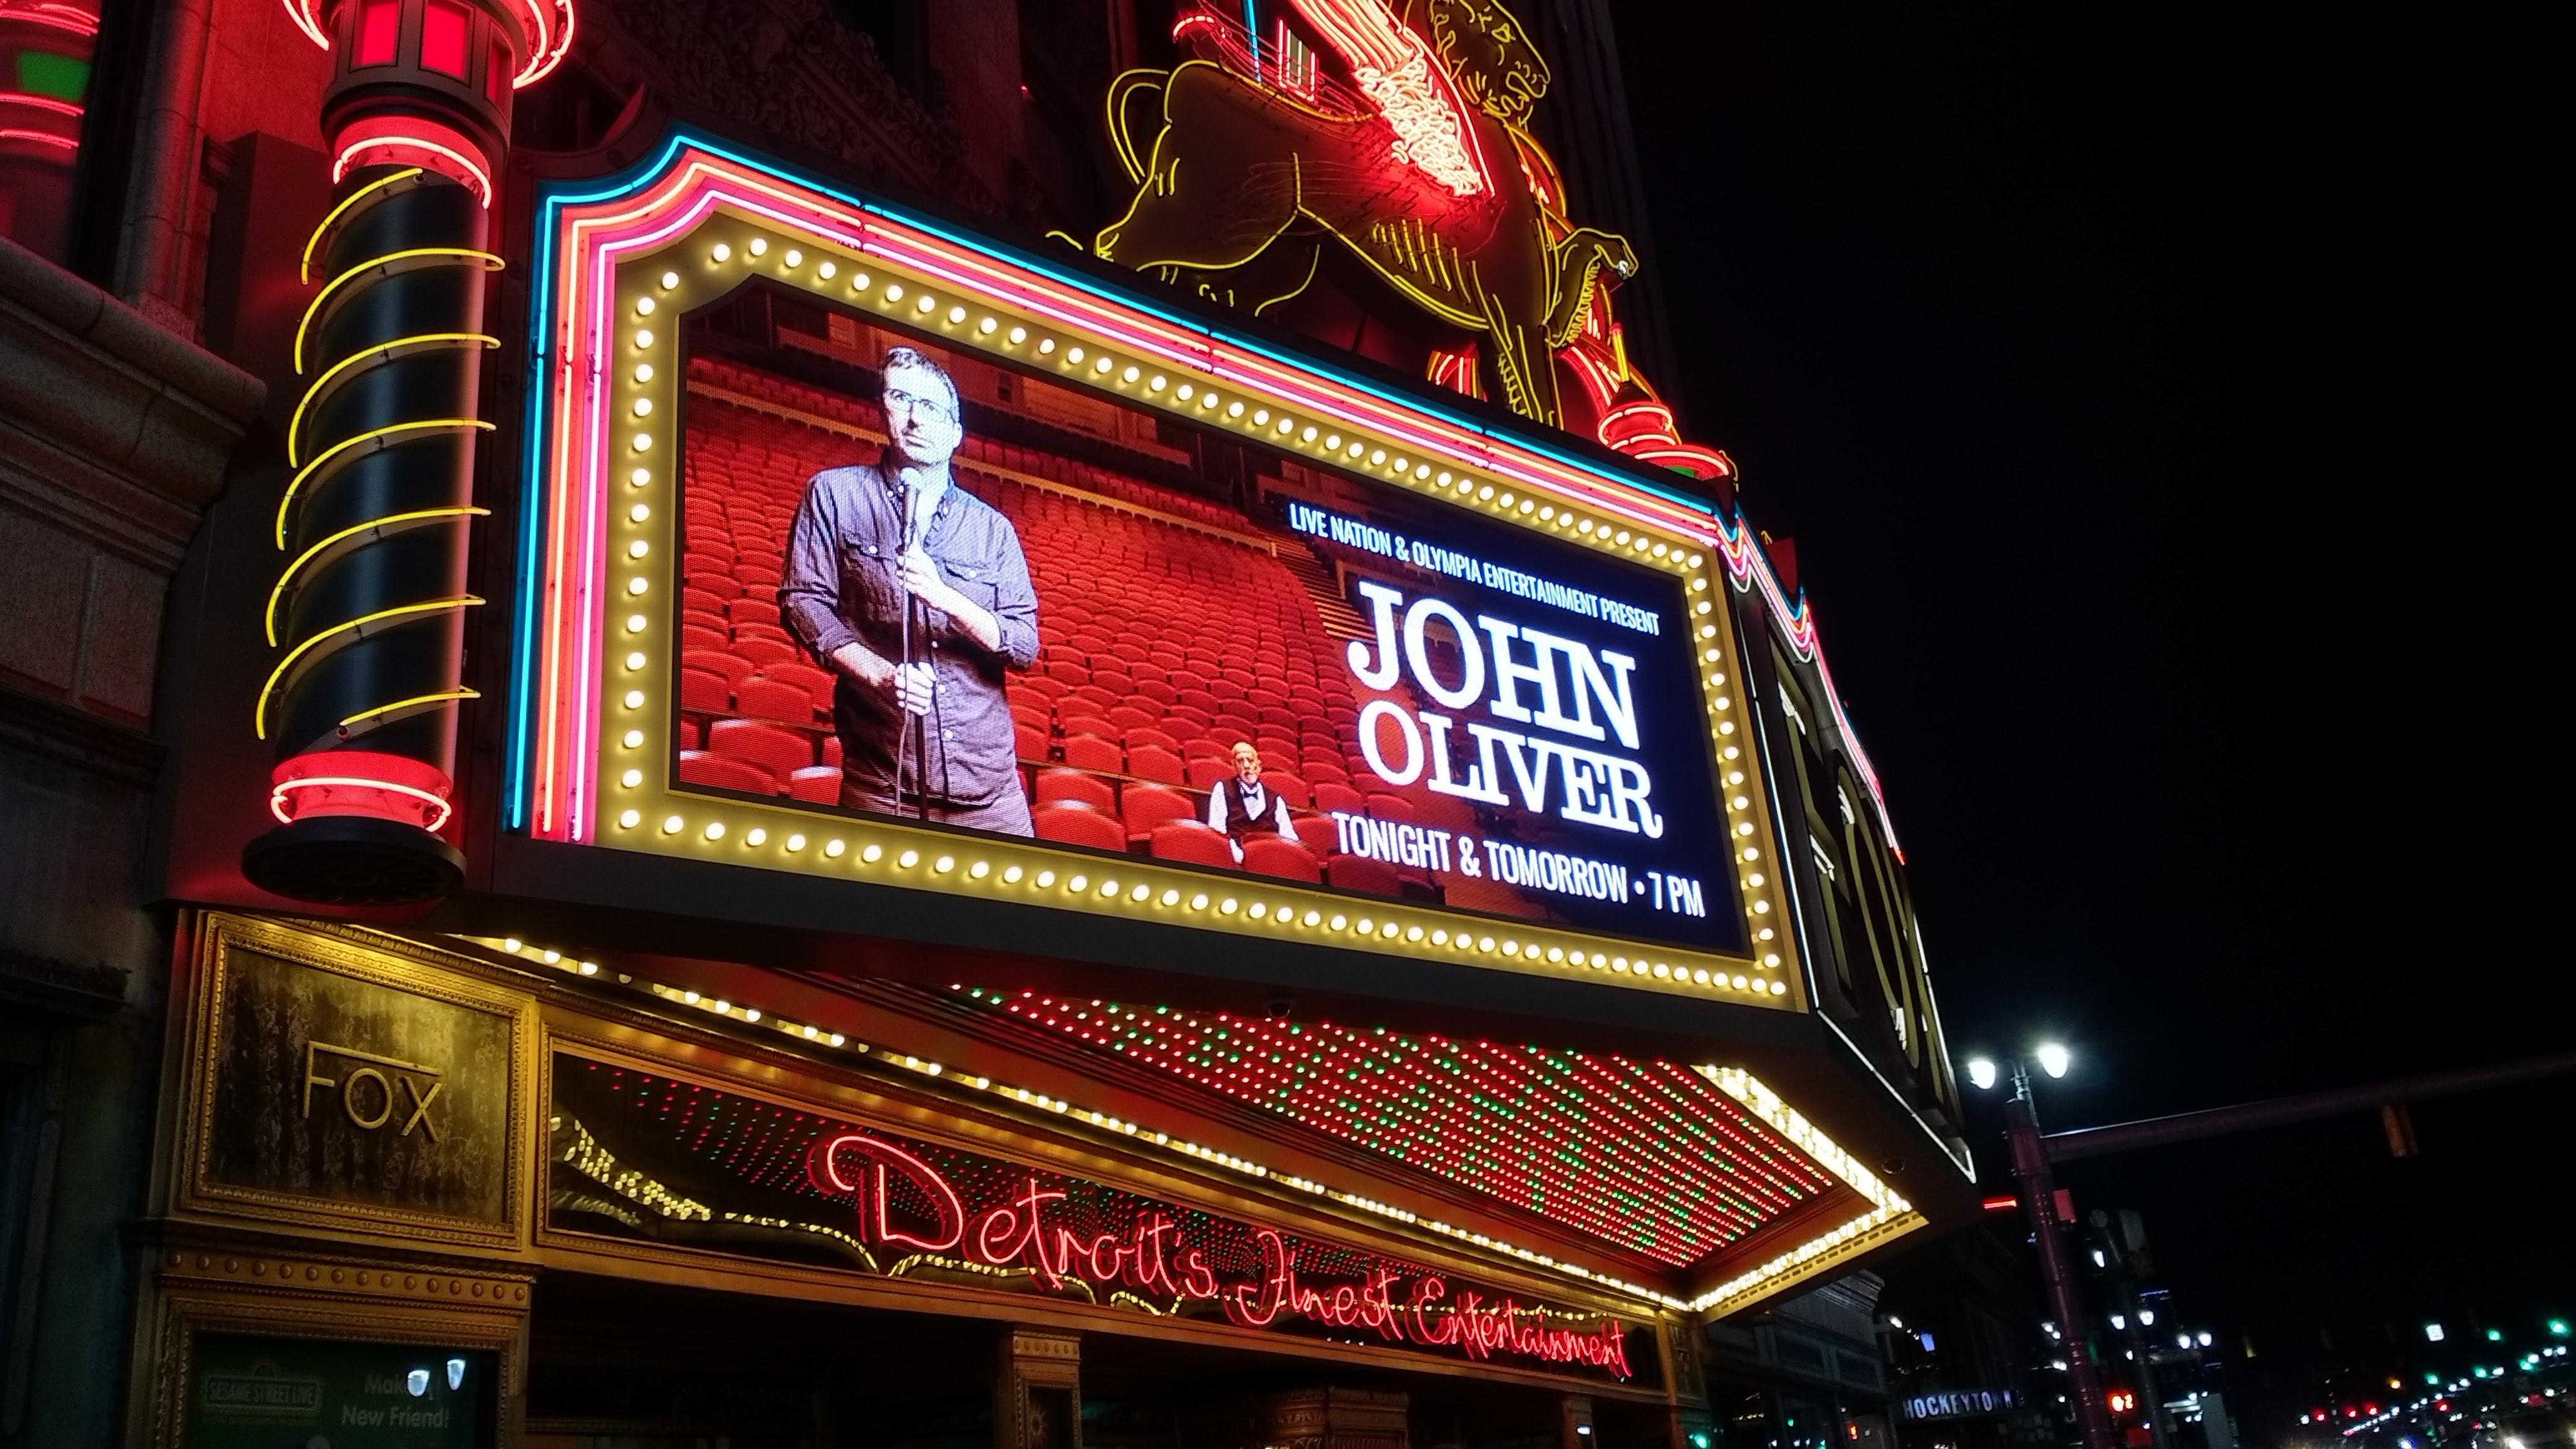 John Oliver in Detroit